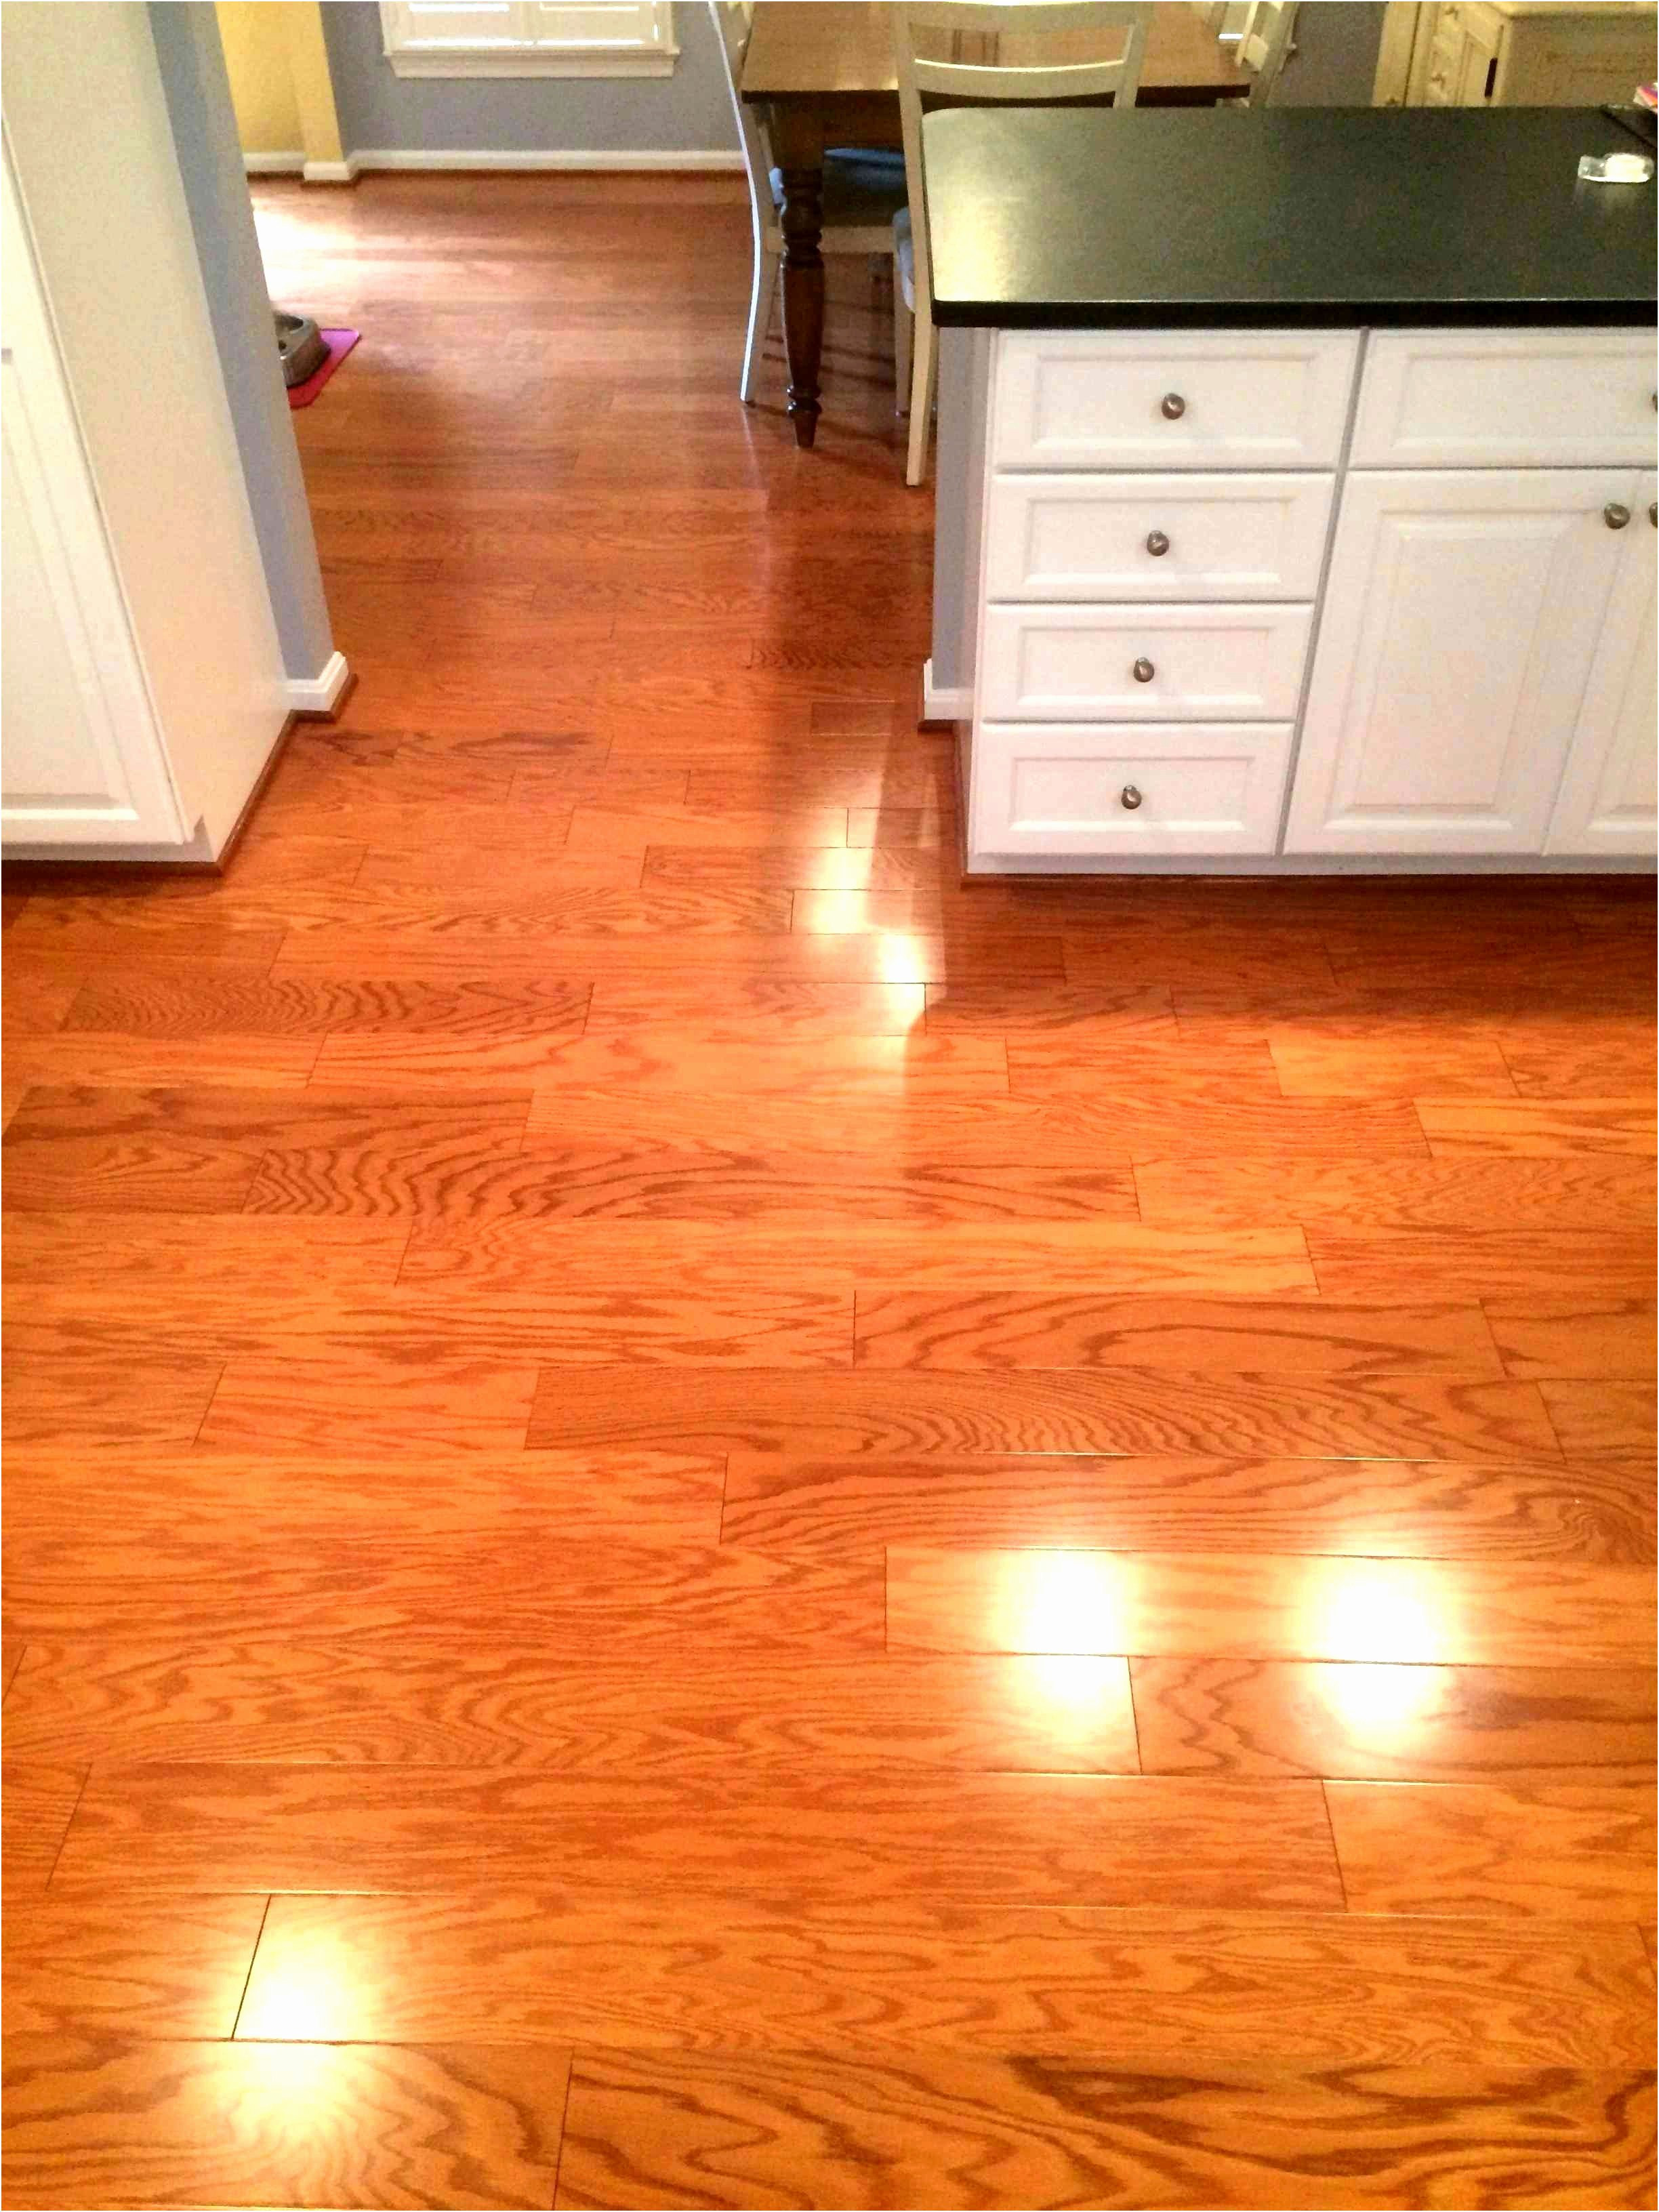 cost to refinish hardwood floors seattle of how to refinish a hardwood floor floor regarding how to refinish a hardwood floor non slip hardwood floor podemosleganes